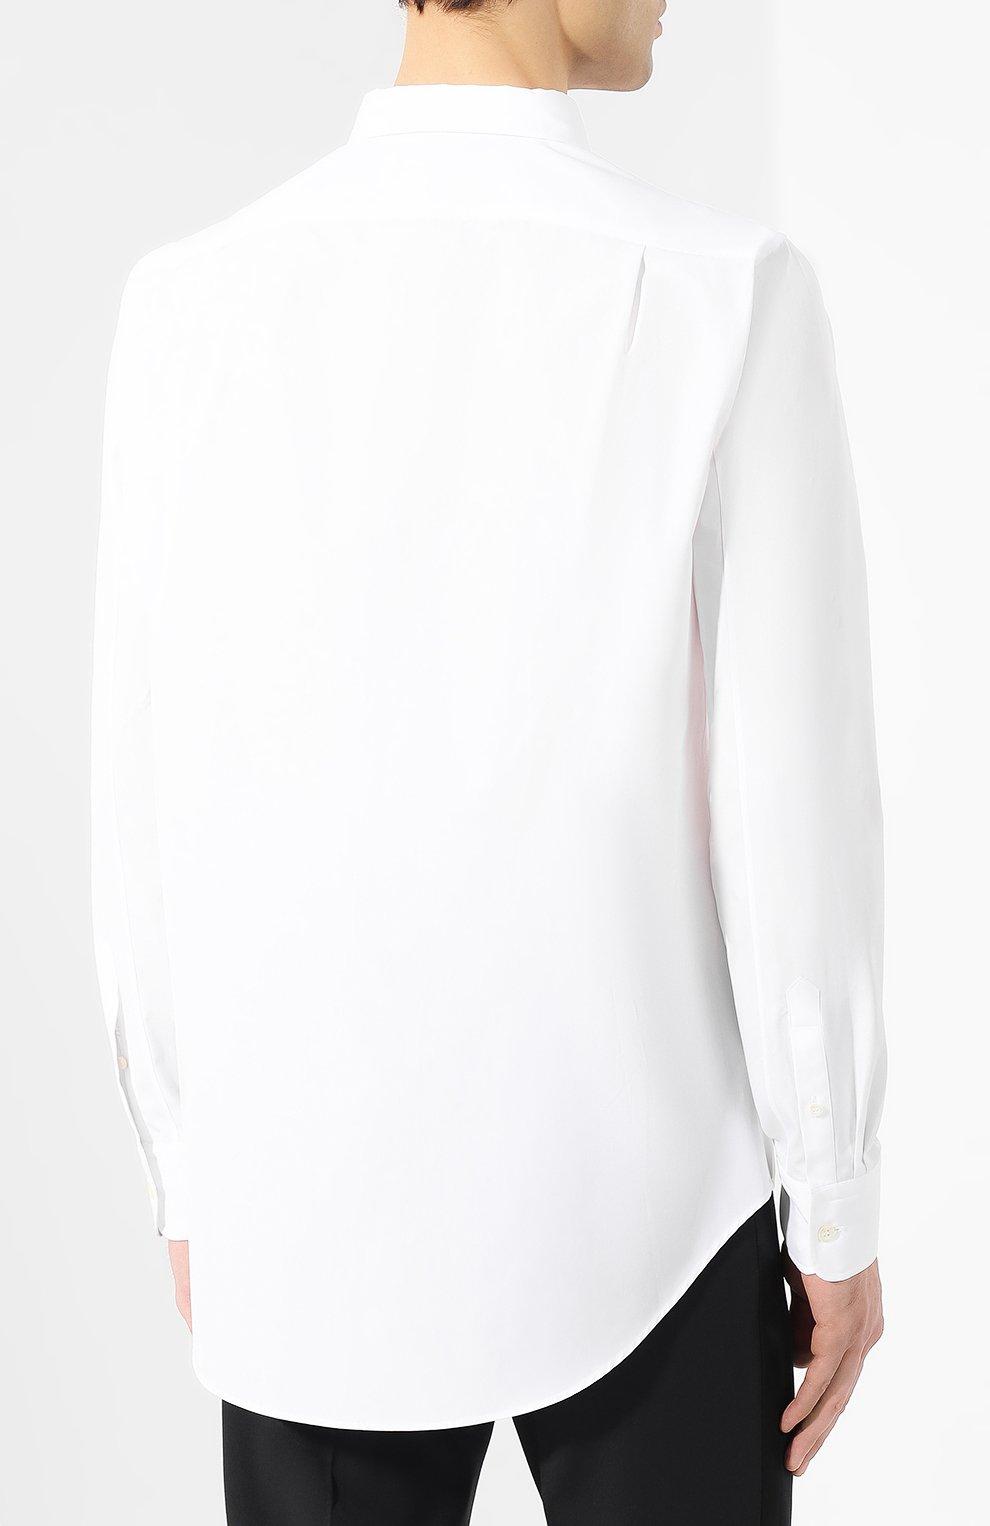 Хлопковая рубашка с воротником button down | Фото №4